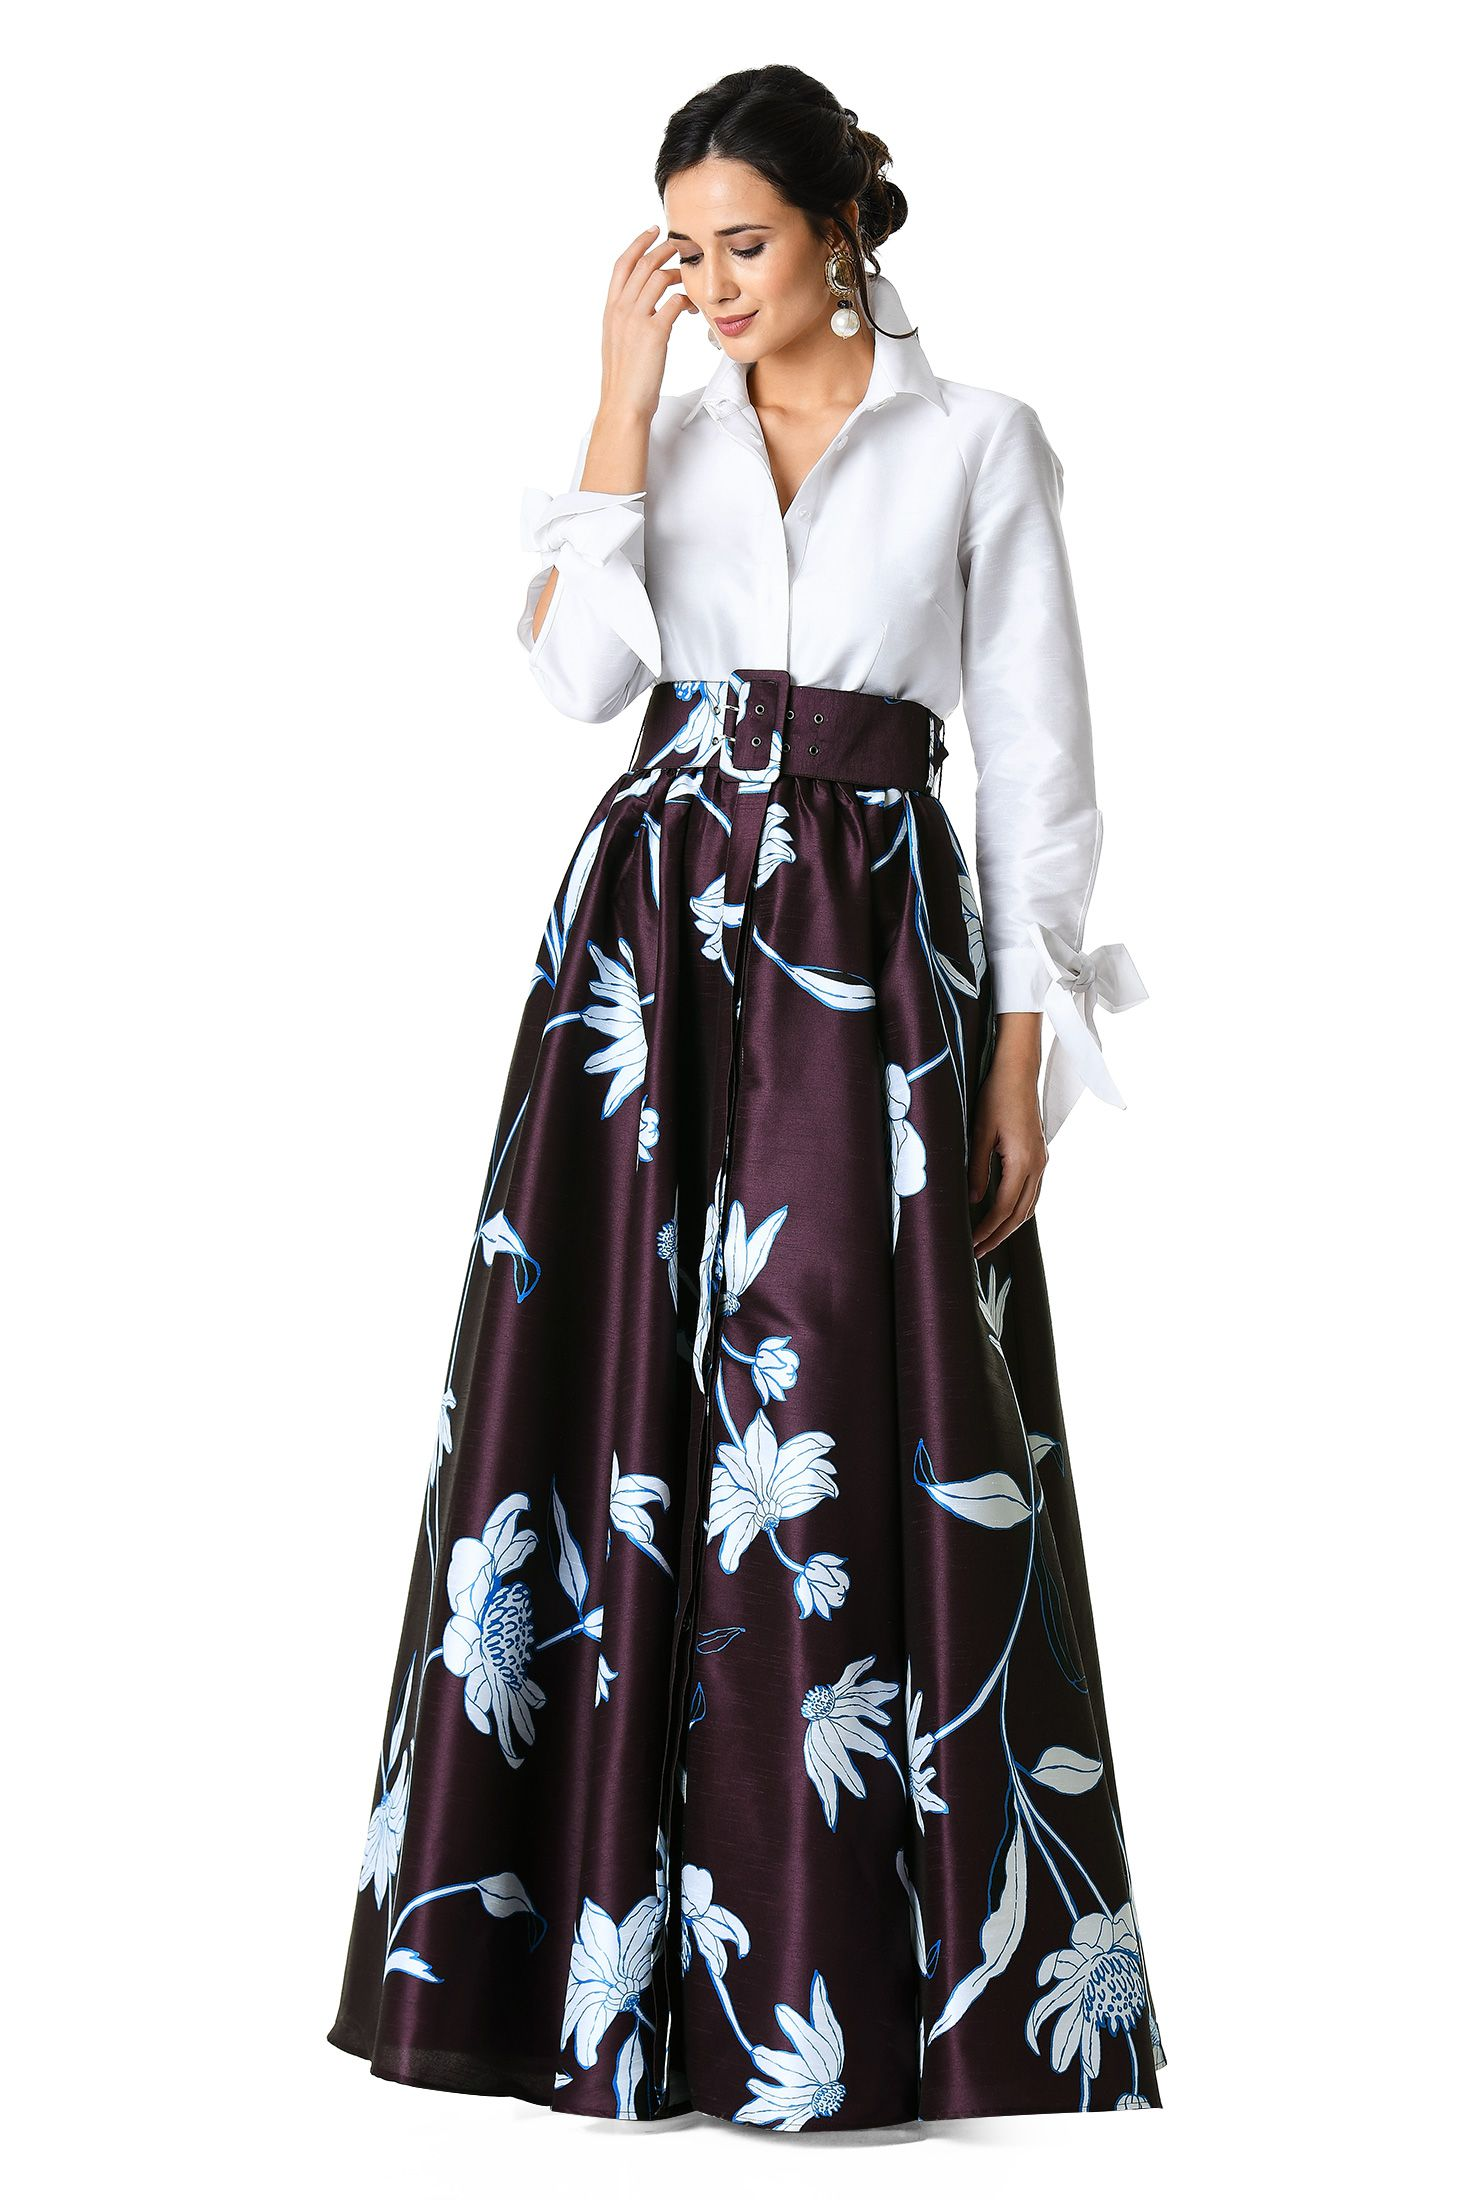 120132a569b Womens Plus Size Sun Dresses - Gomes Weine AG